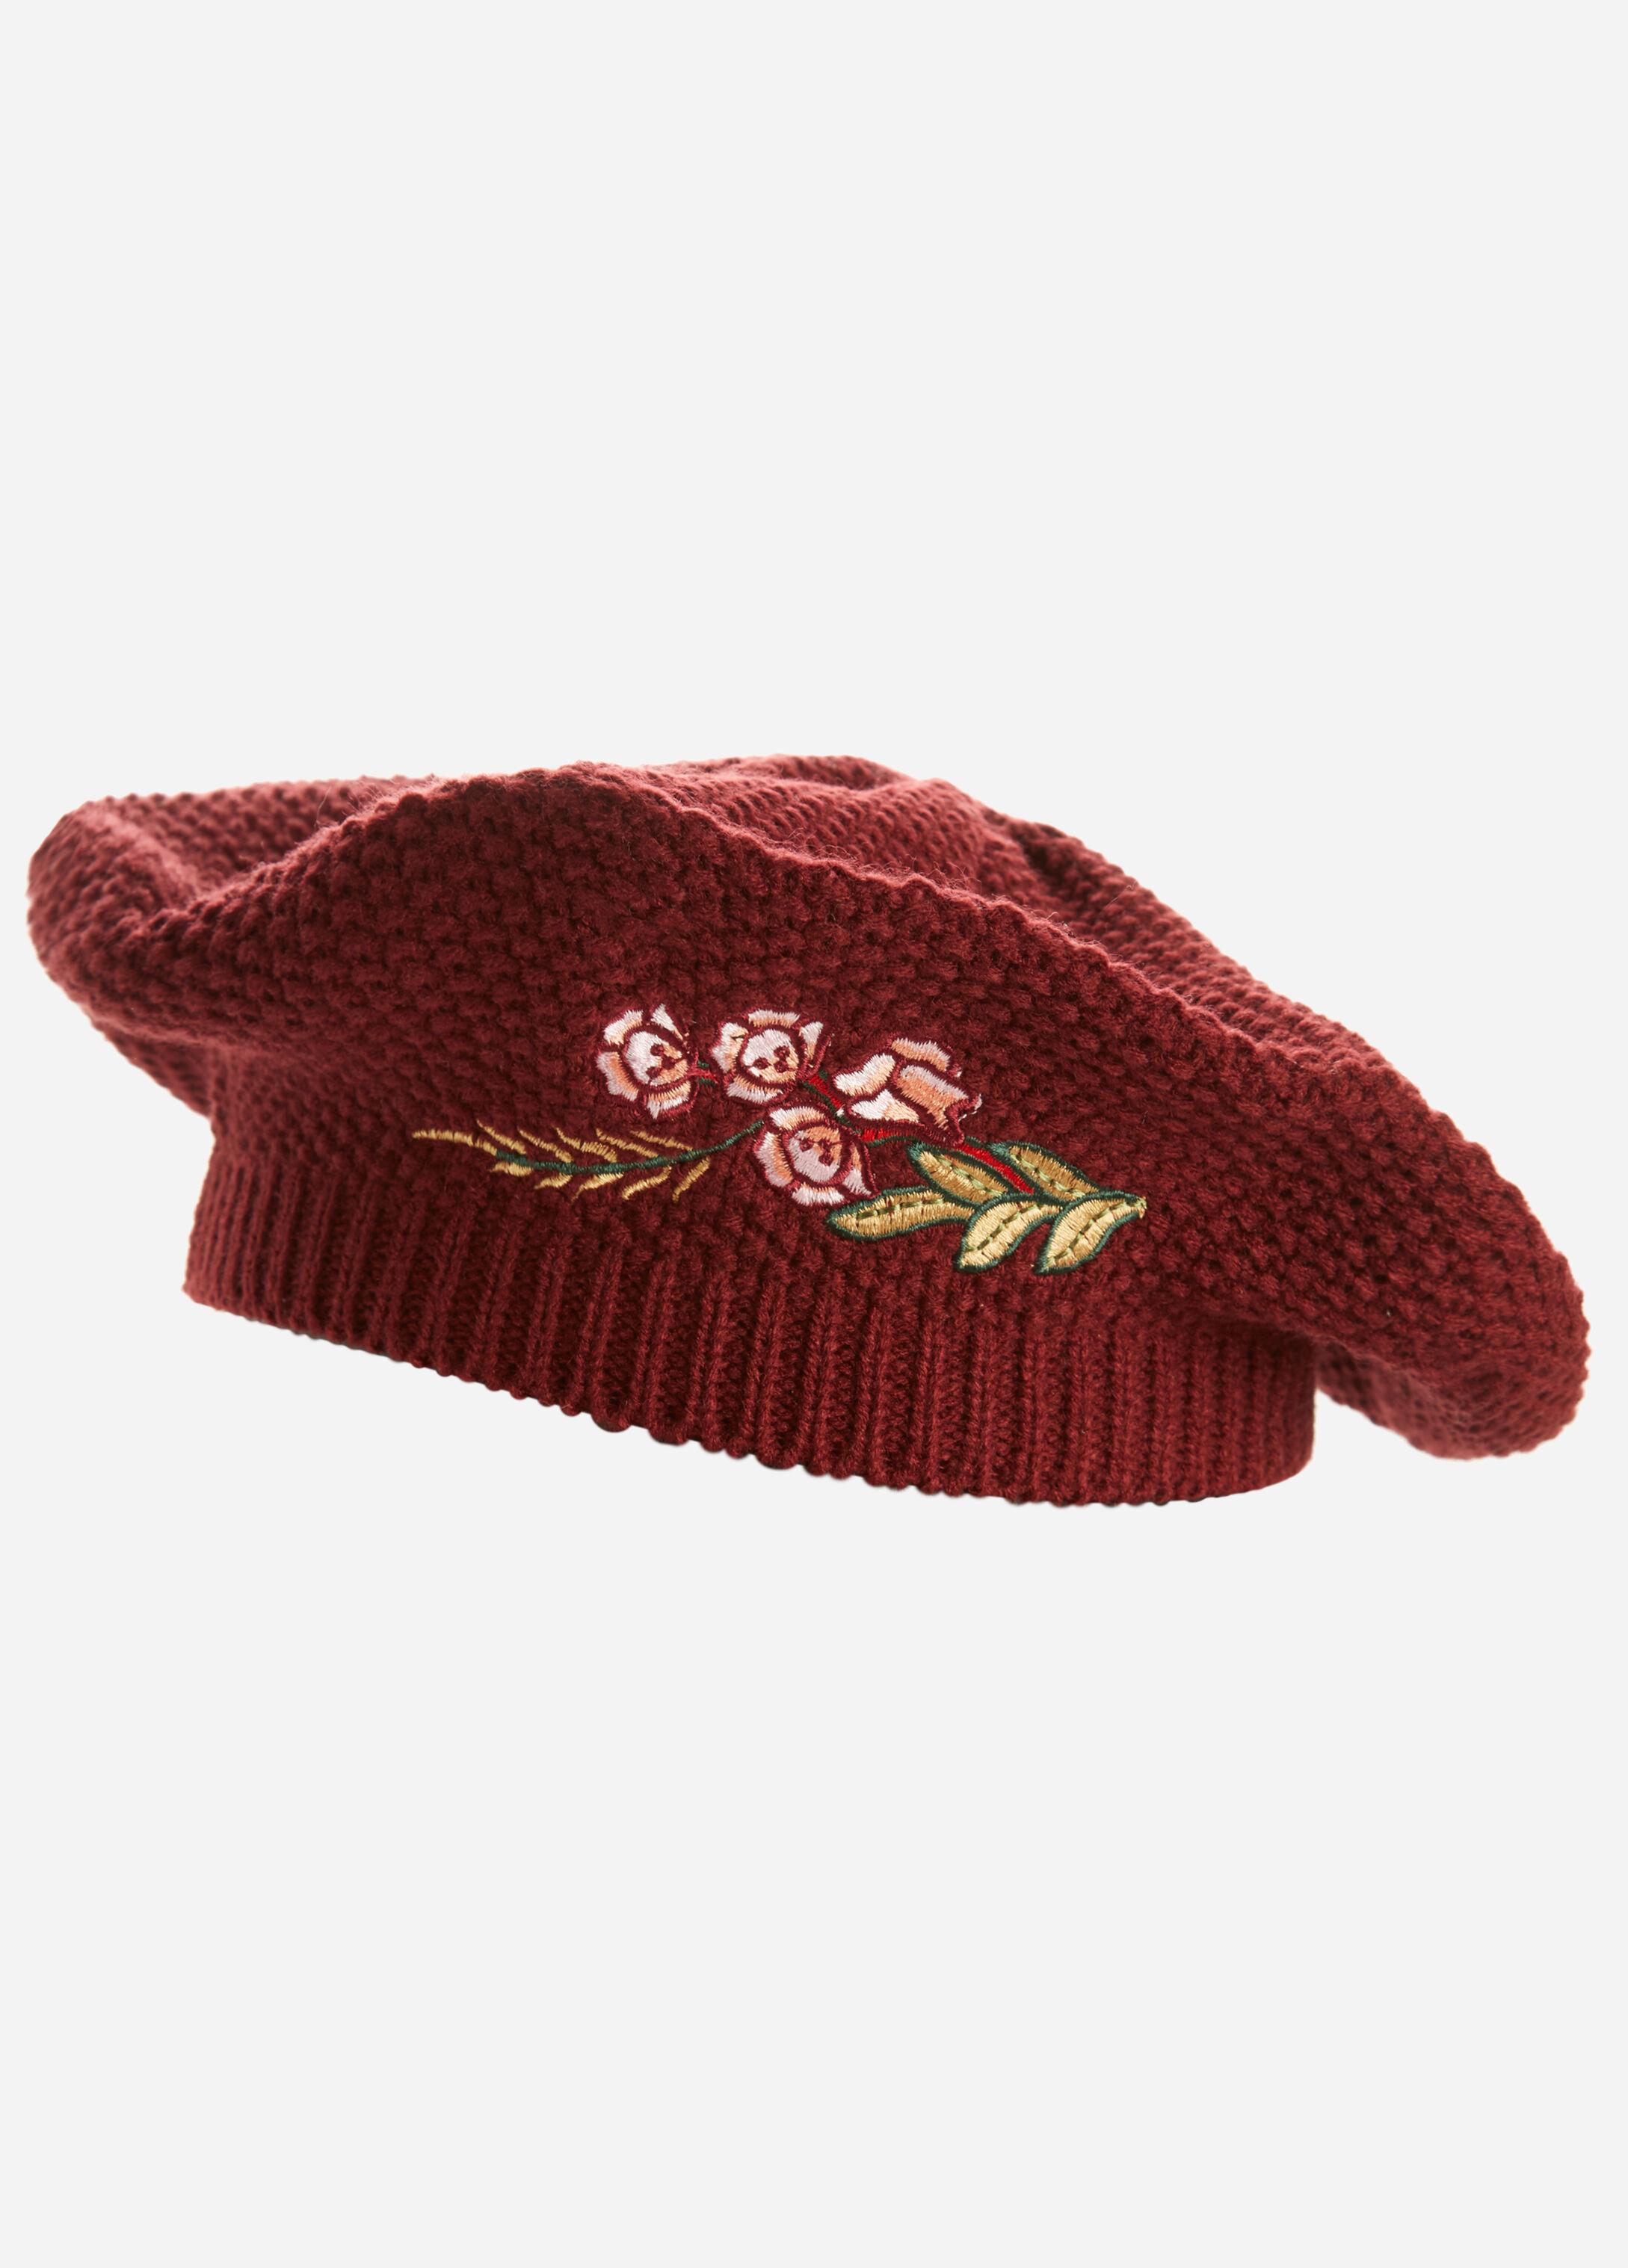 Floral Embroidered Knit Beret